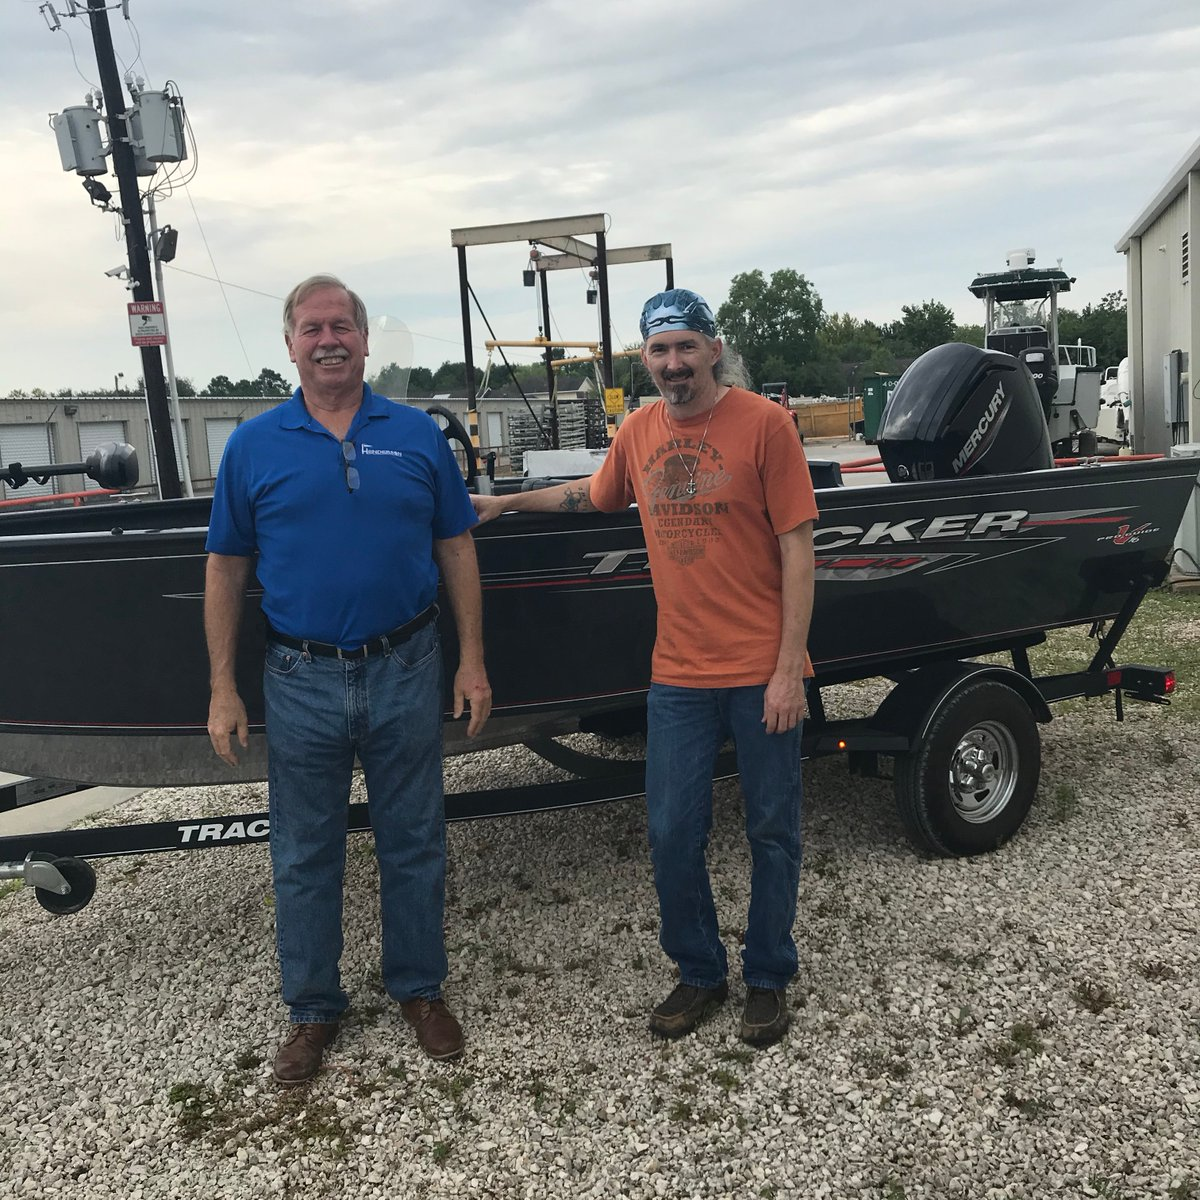 Charles Elliot just got his new Tracker PGV16C! Enjoy the boat!  #teamhenderson #fishing #fish #bassfishing #outdoors #largemouthbass #angler #largemouth #tightlines #bigbass #fishon #gonefishing #basslife #outdoor #fishinglures #getoutside #fishinglife #Louisiana #lakeCharles